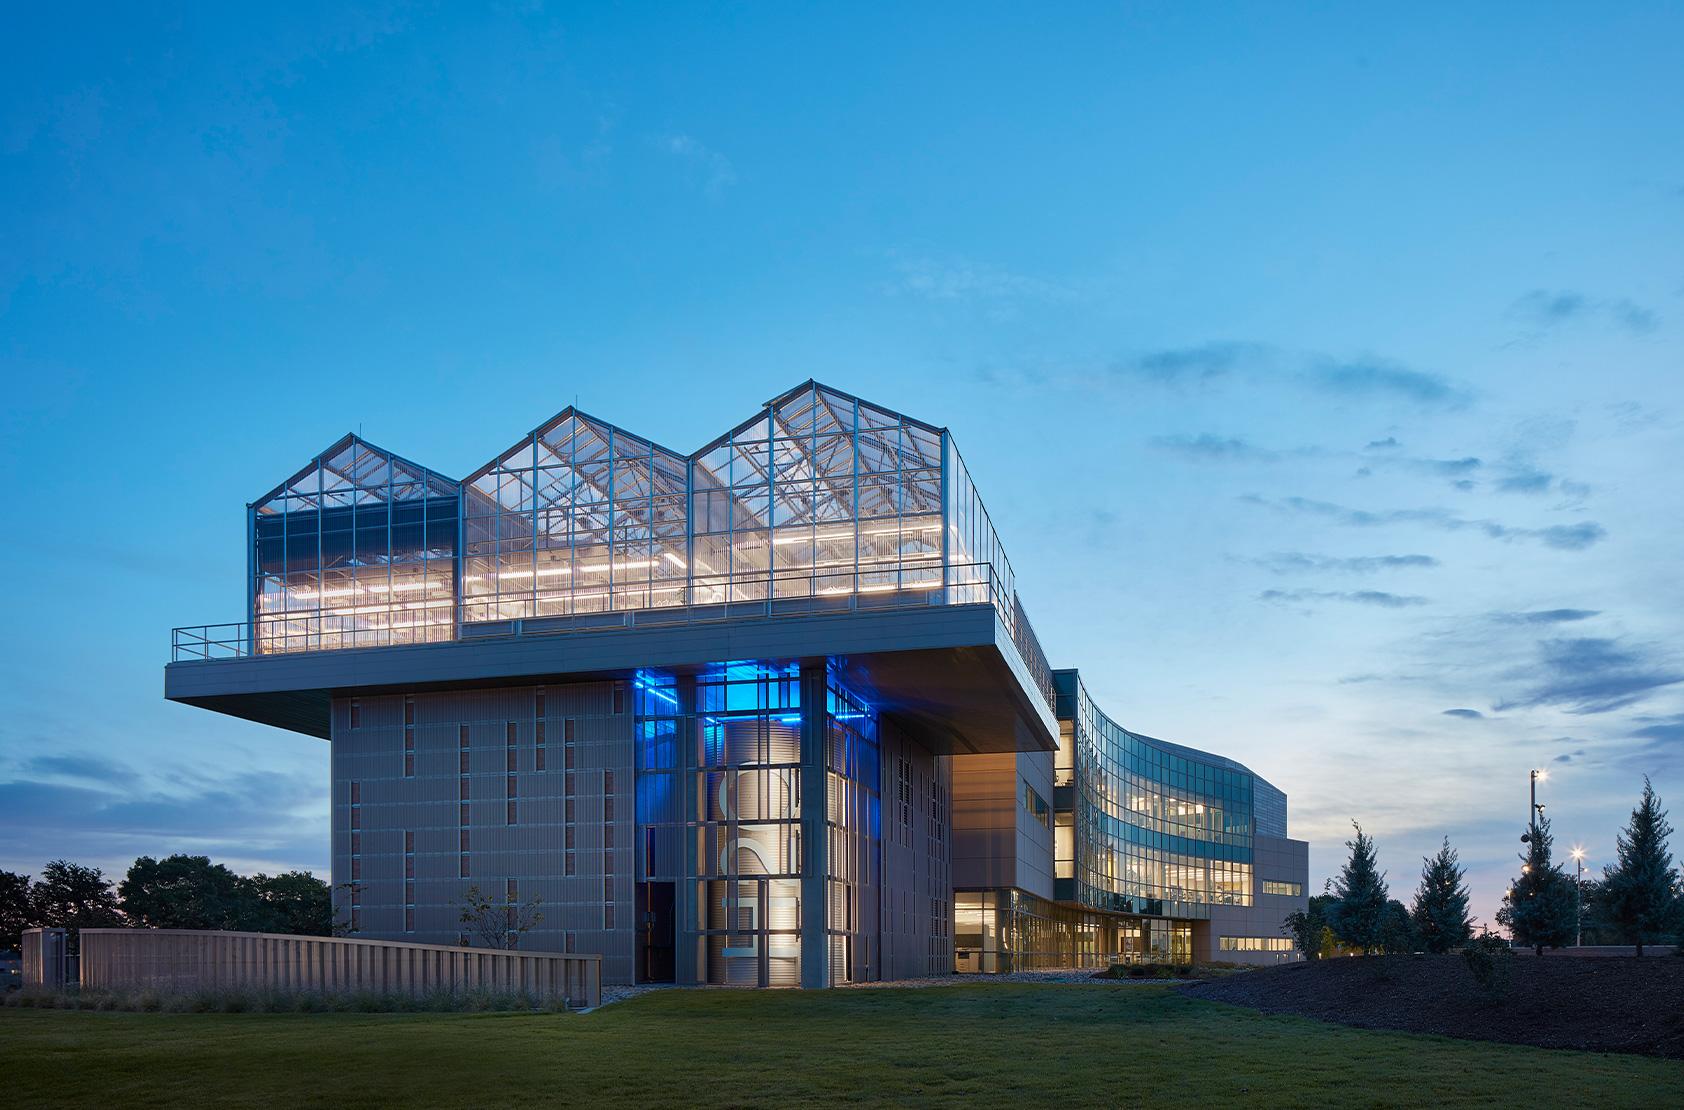 Texas A&M University - Dallas AgriLife Research Center